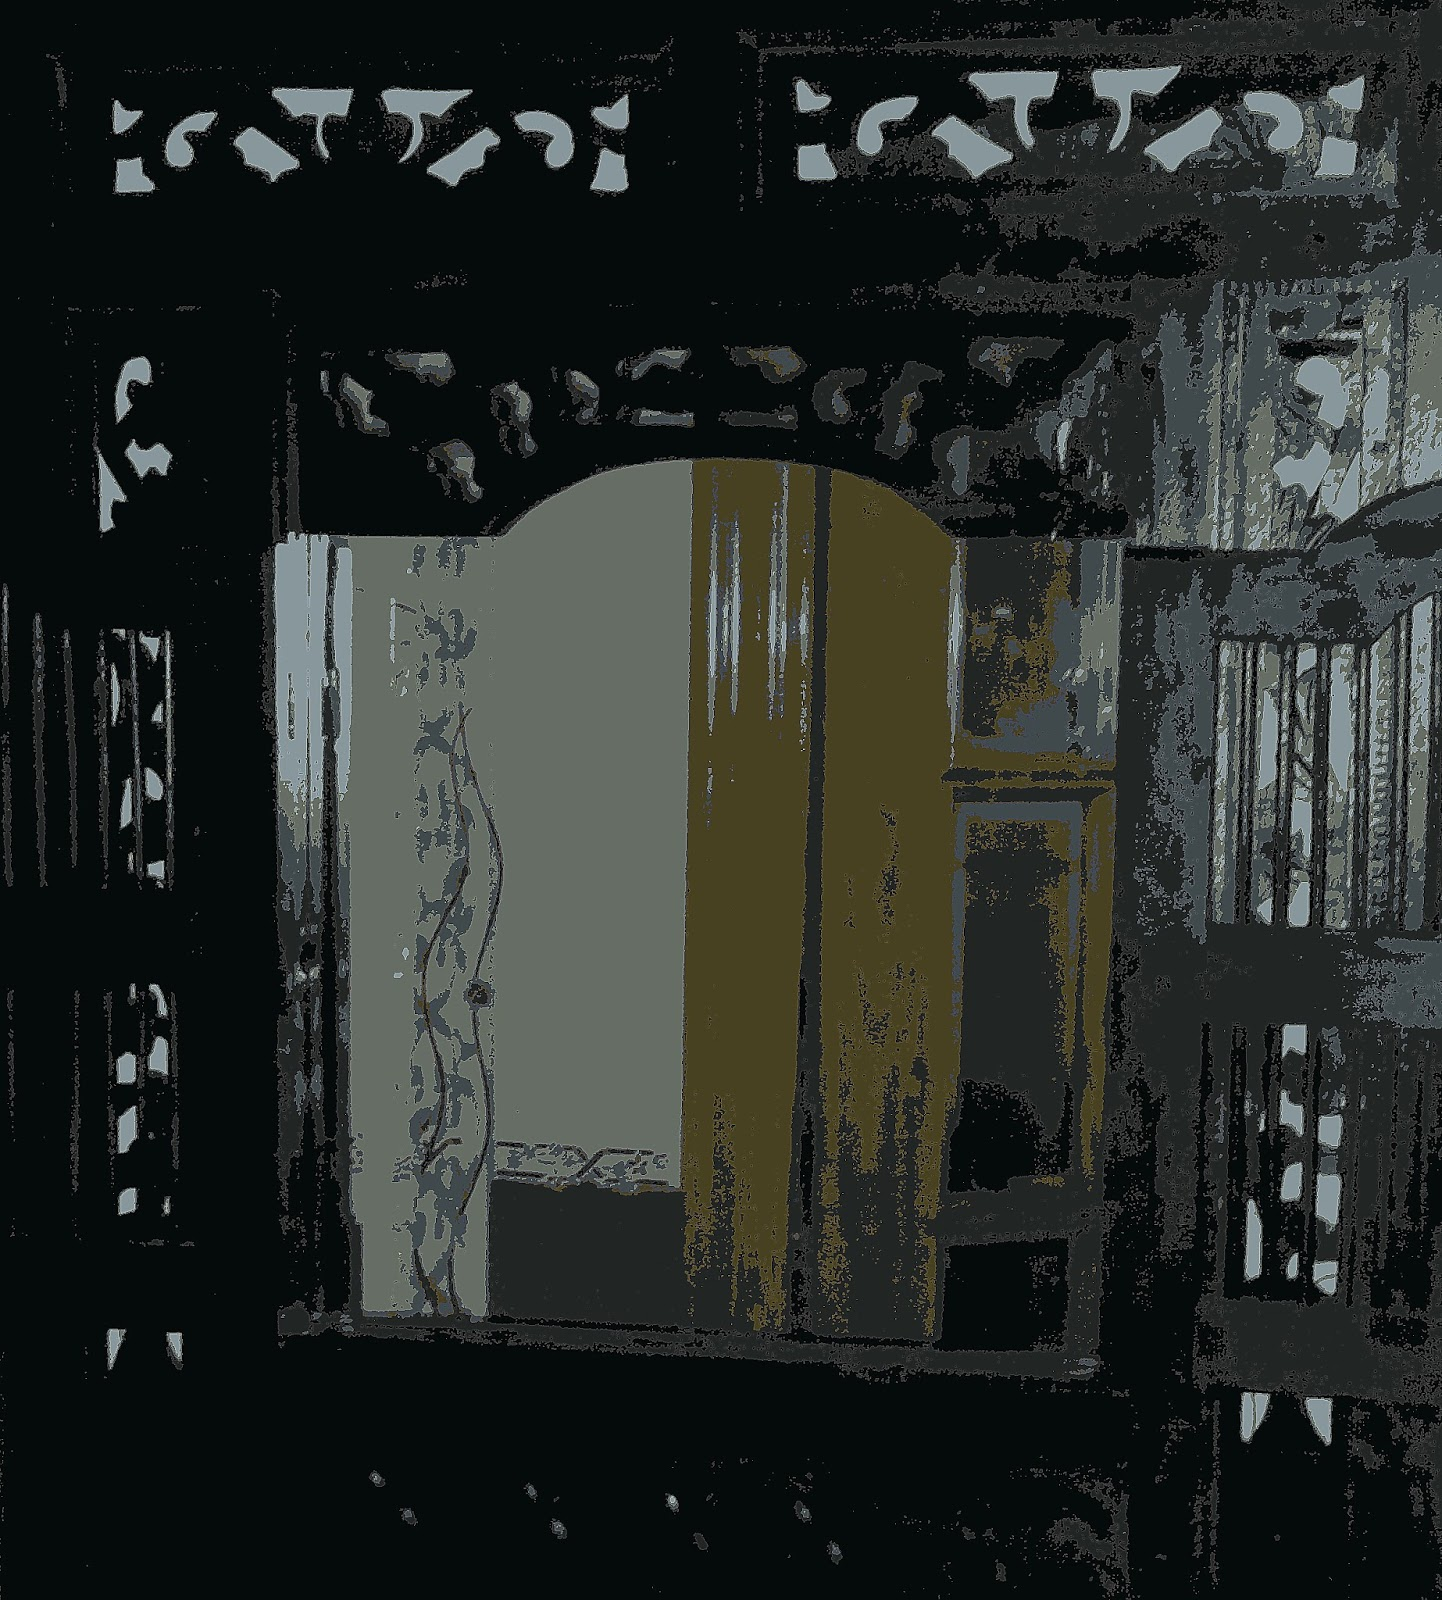 Sitio de ngeles - Romper un espejo ...